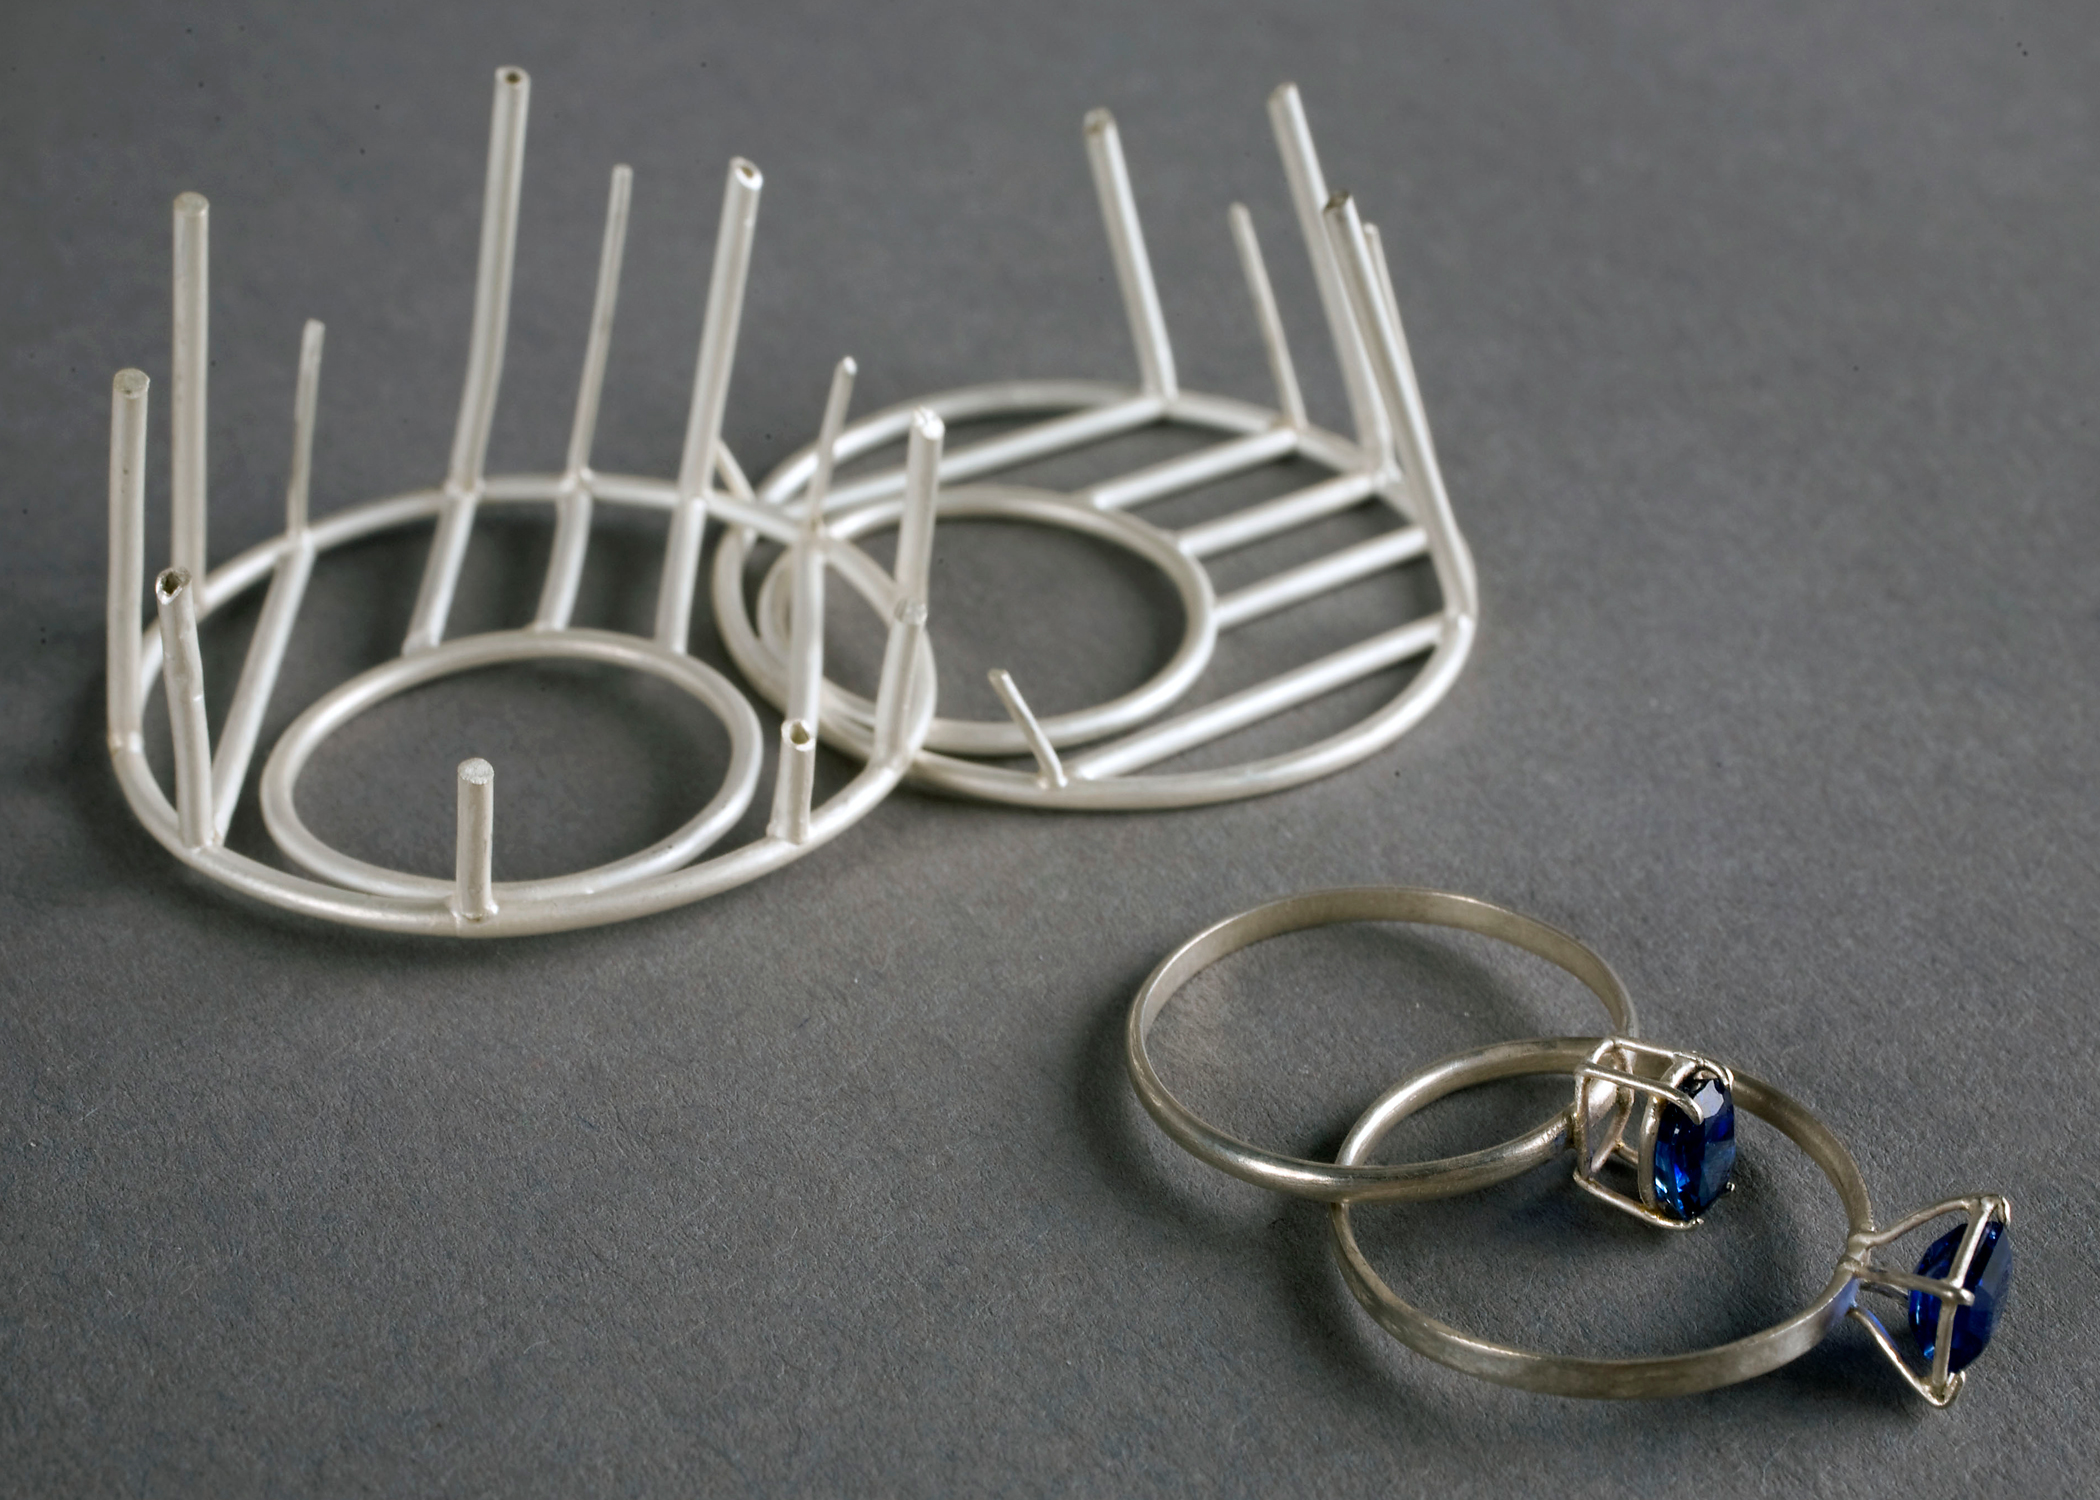 Cozy Indigo Rings detail